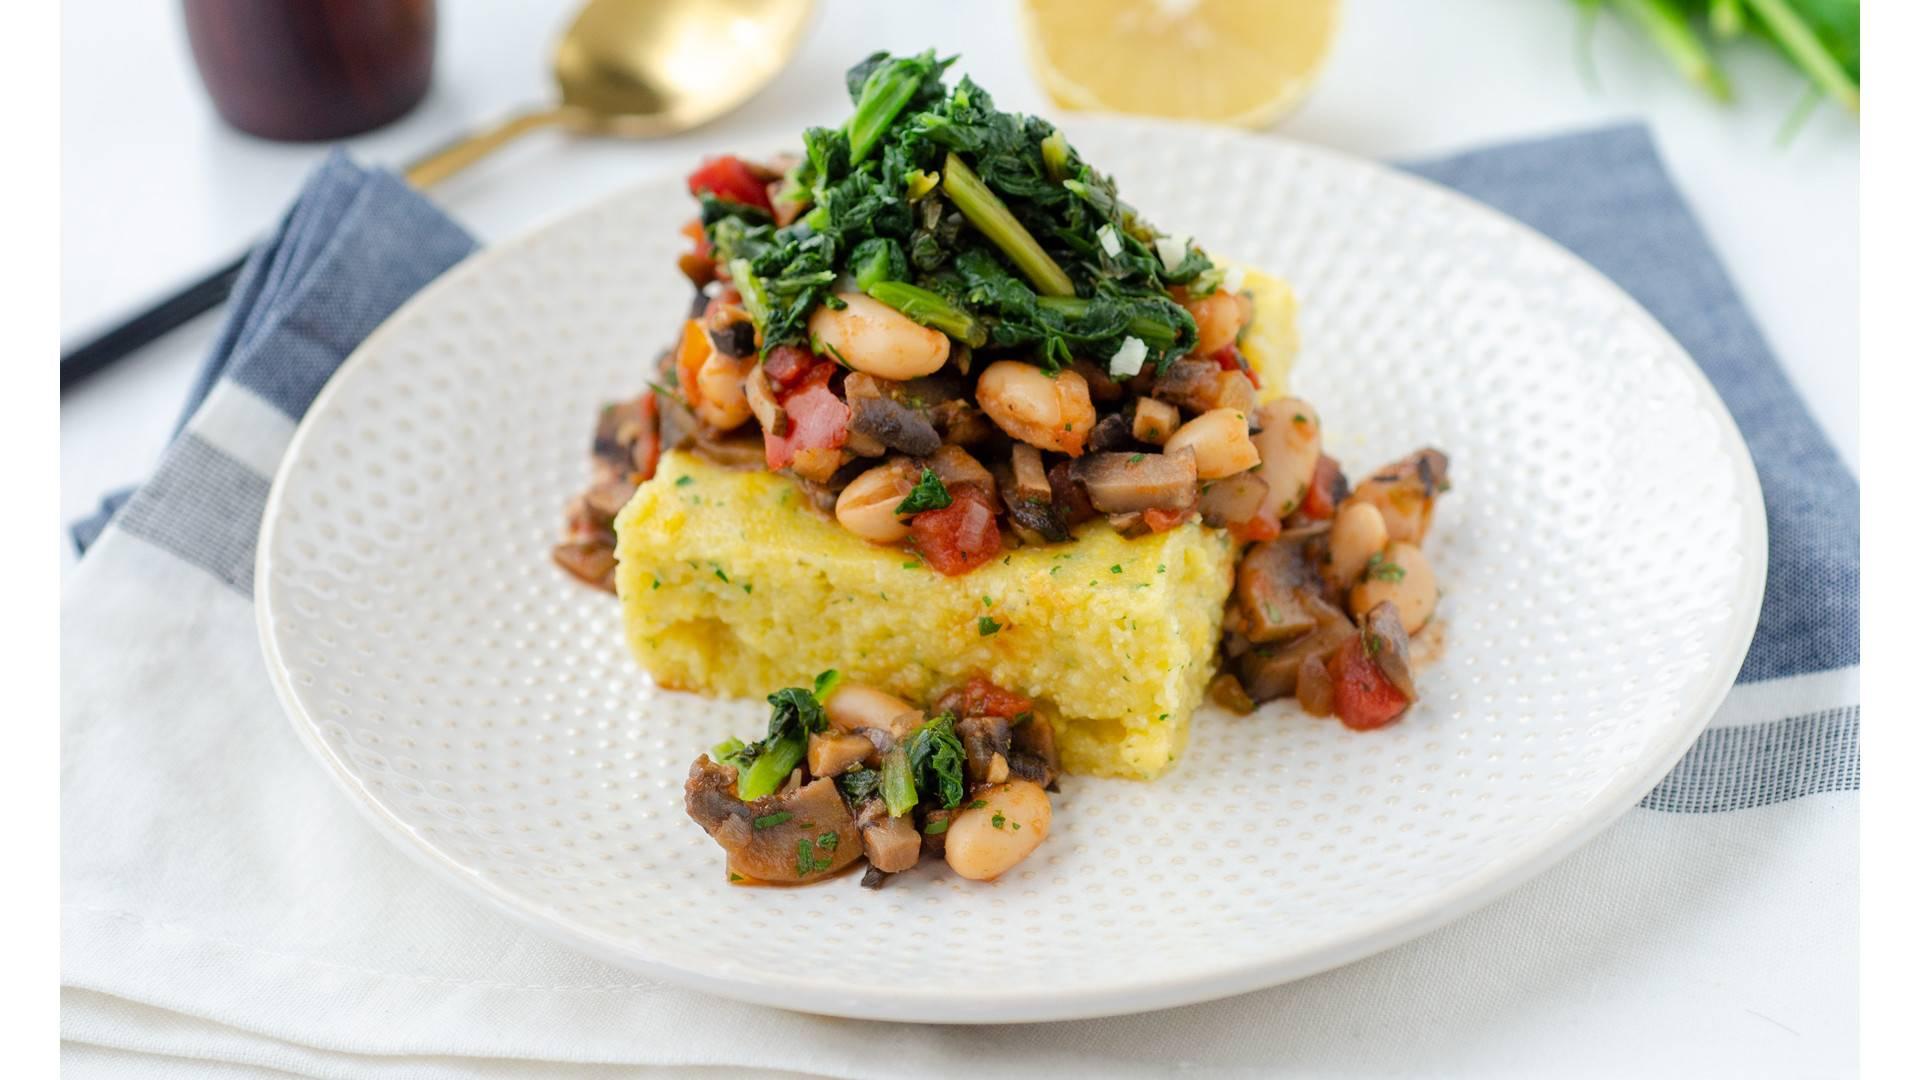 Mushroom Ragout With Herbed Polenta and Garlicky Kale